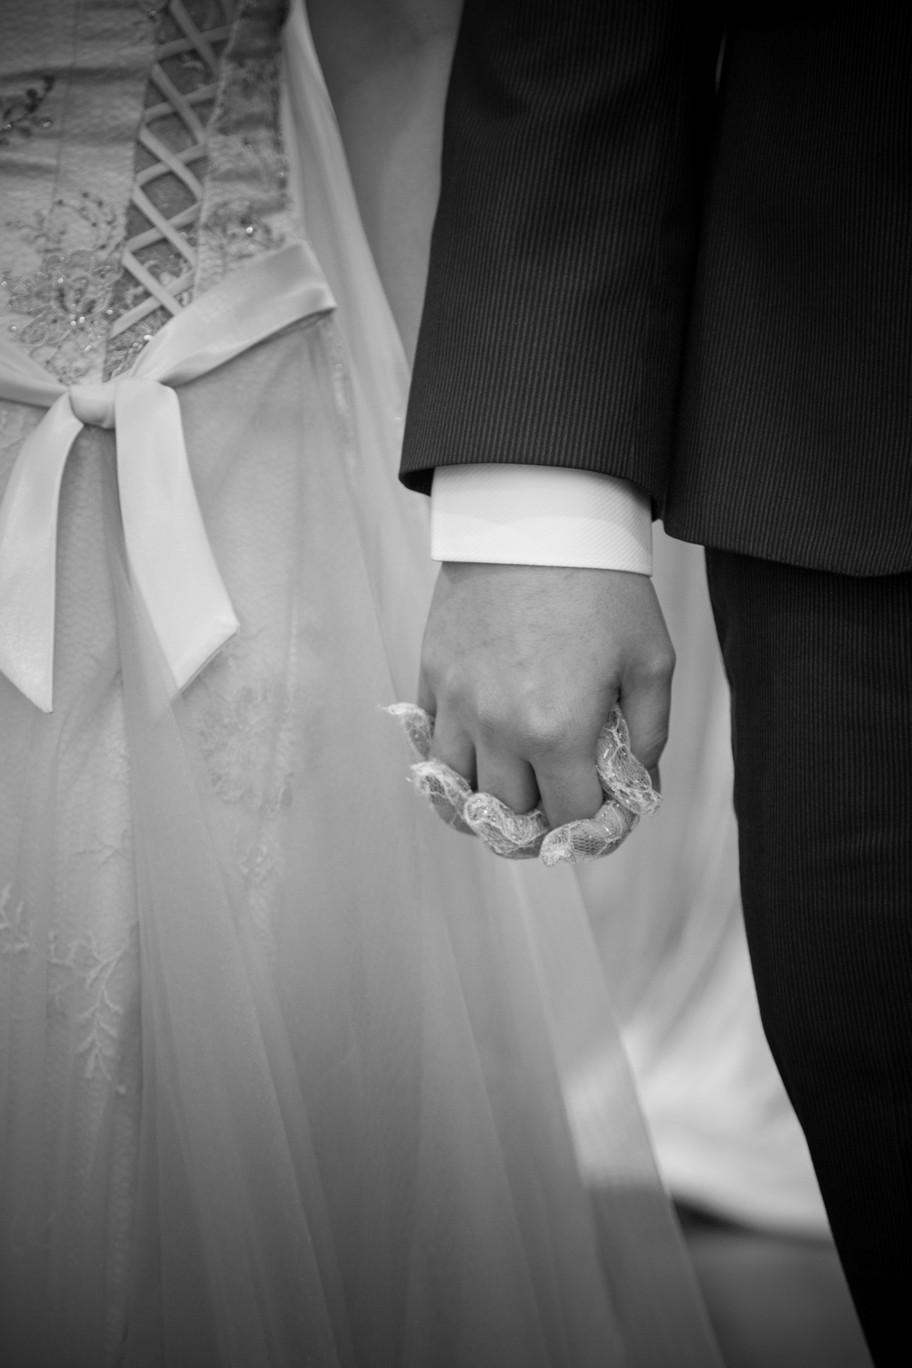 wedding-photo-000366